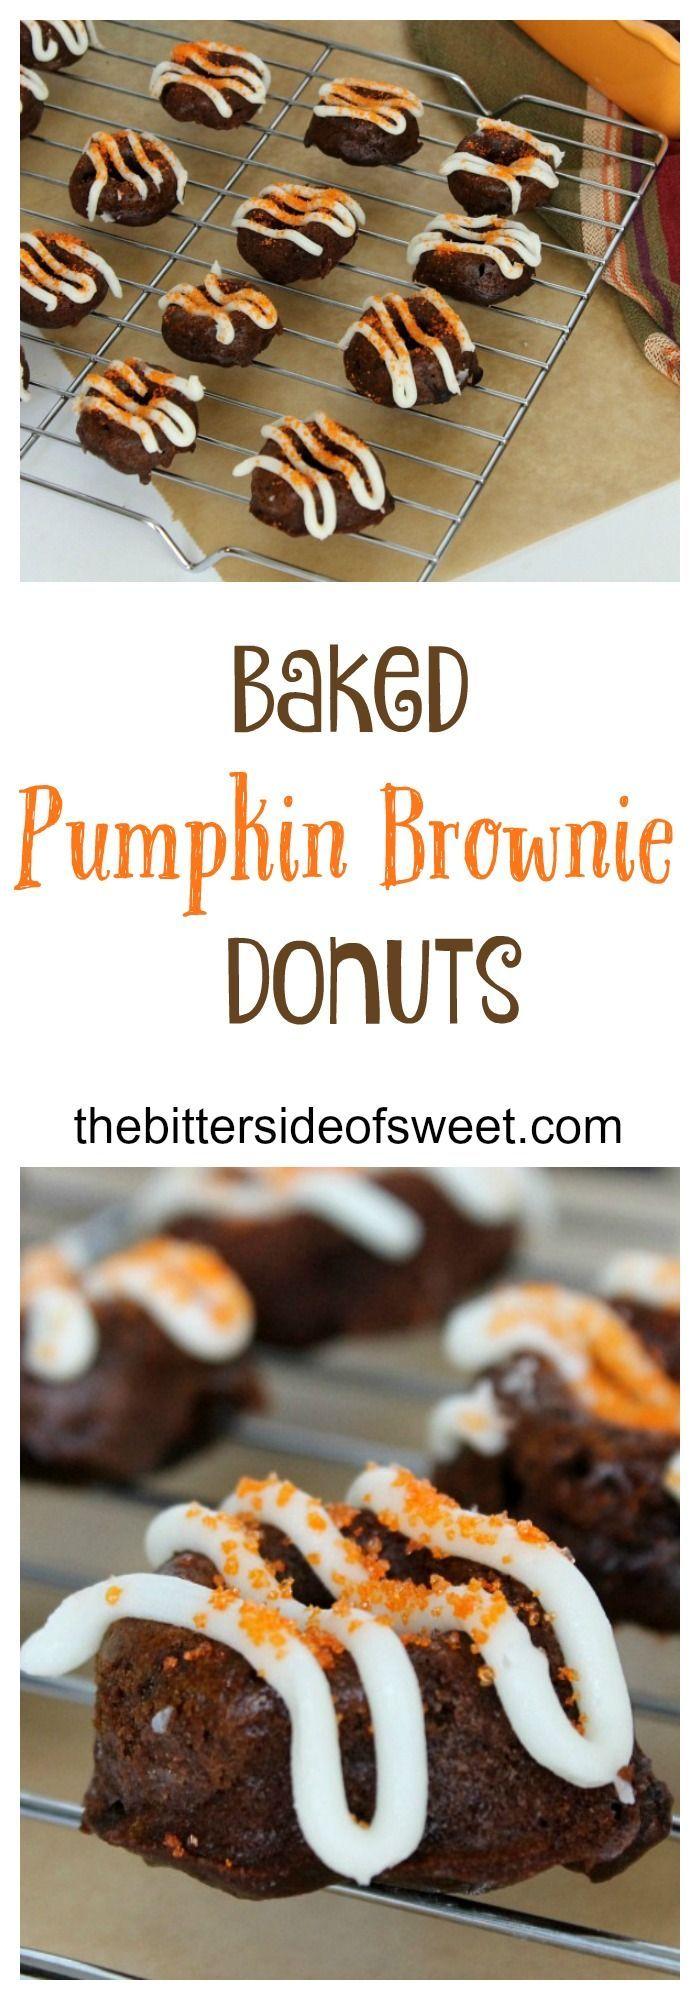 Baked Pumpkin Brownie Donuts   The Bitter Side of Sweet #donuts #brownie #chocolate #pumpkin